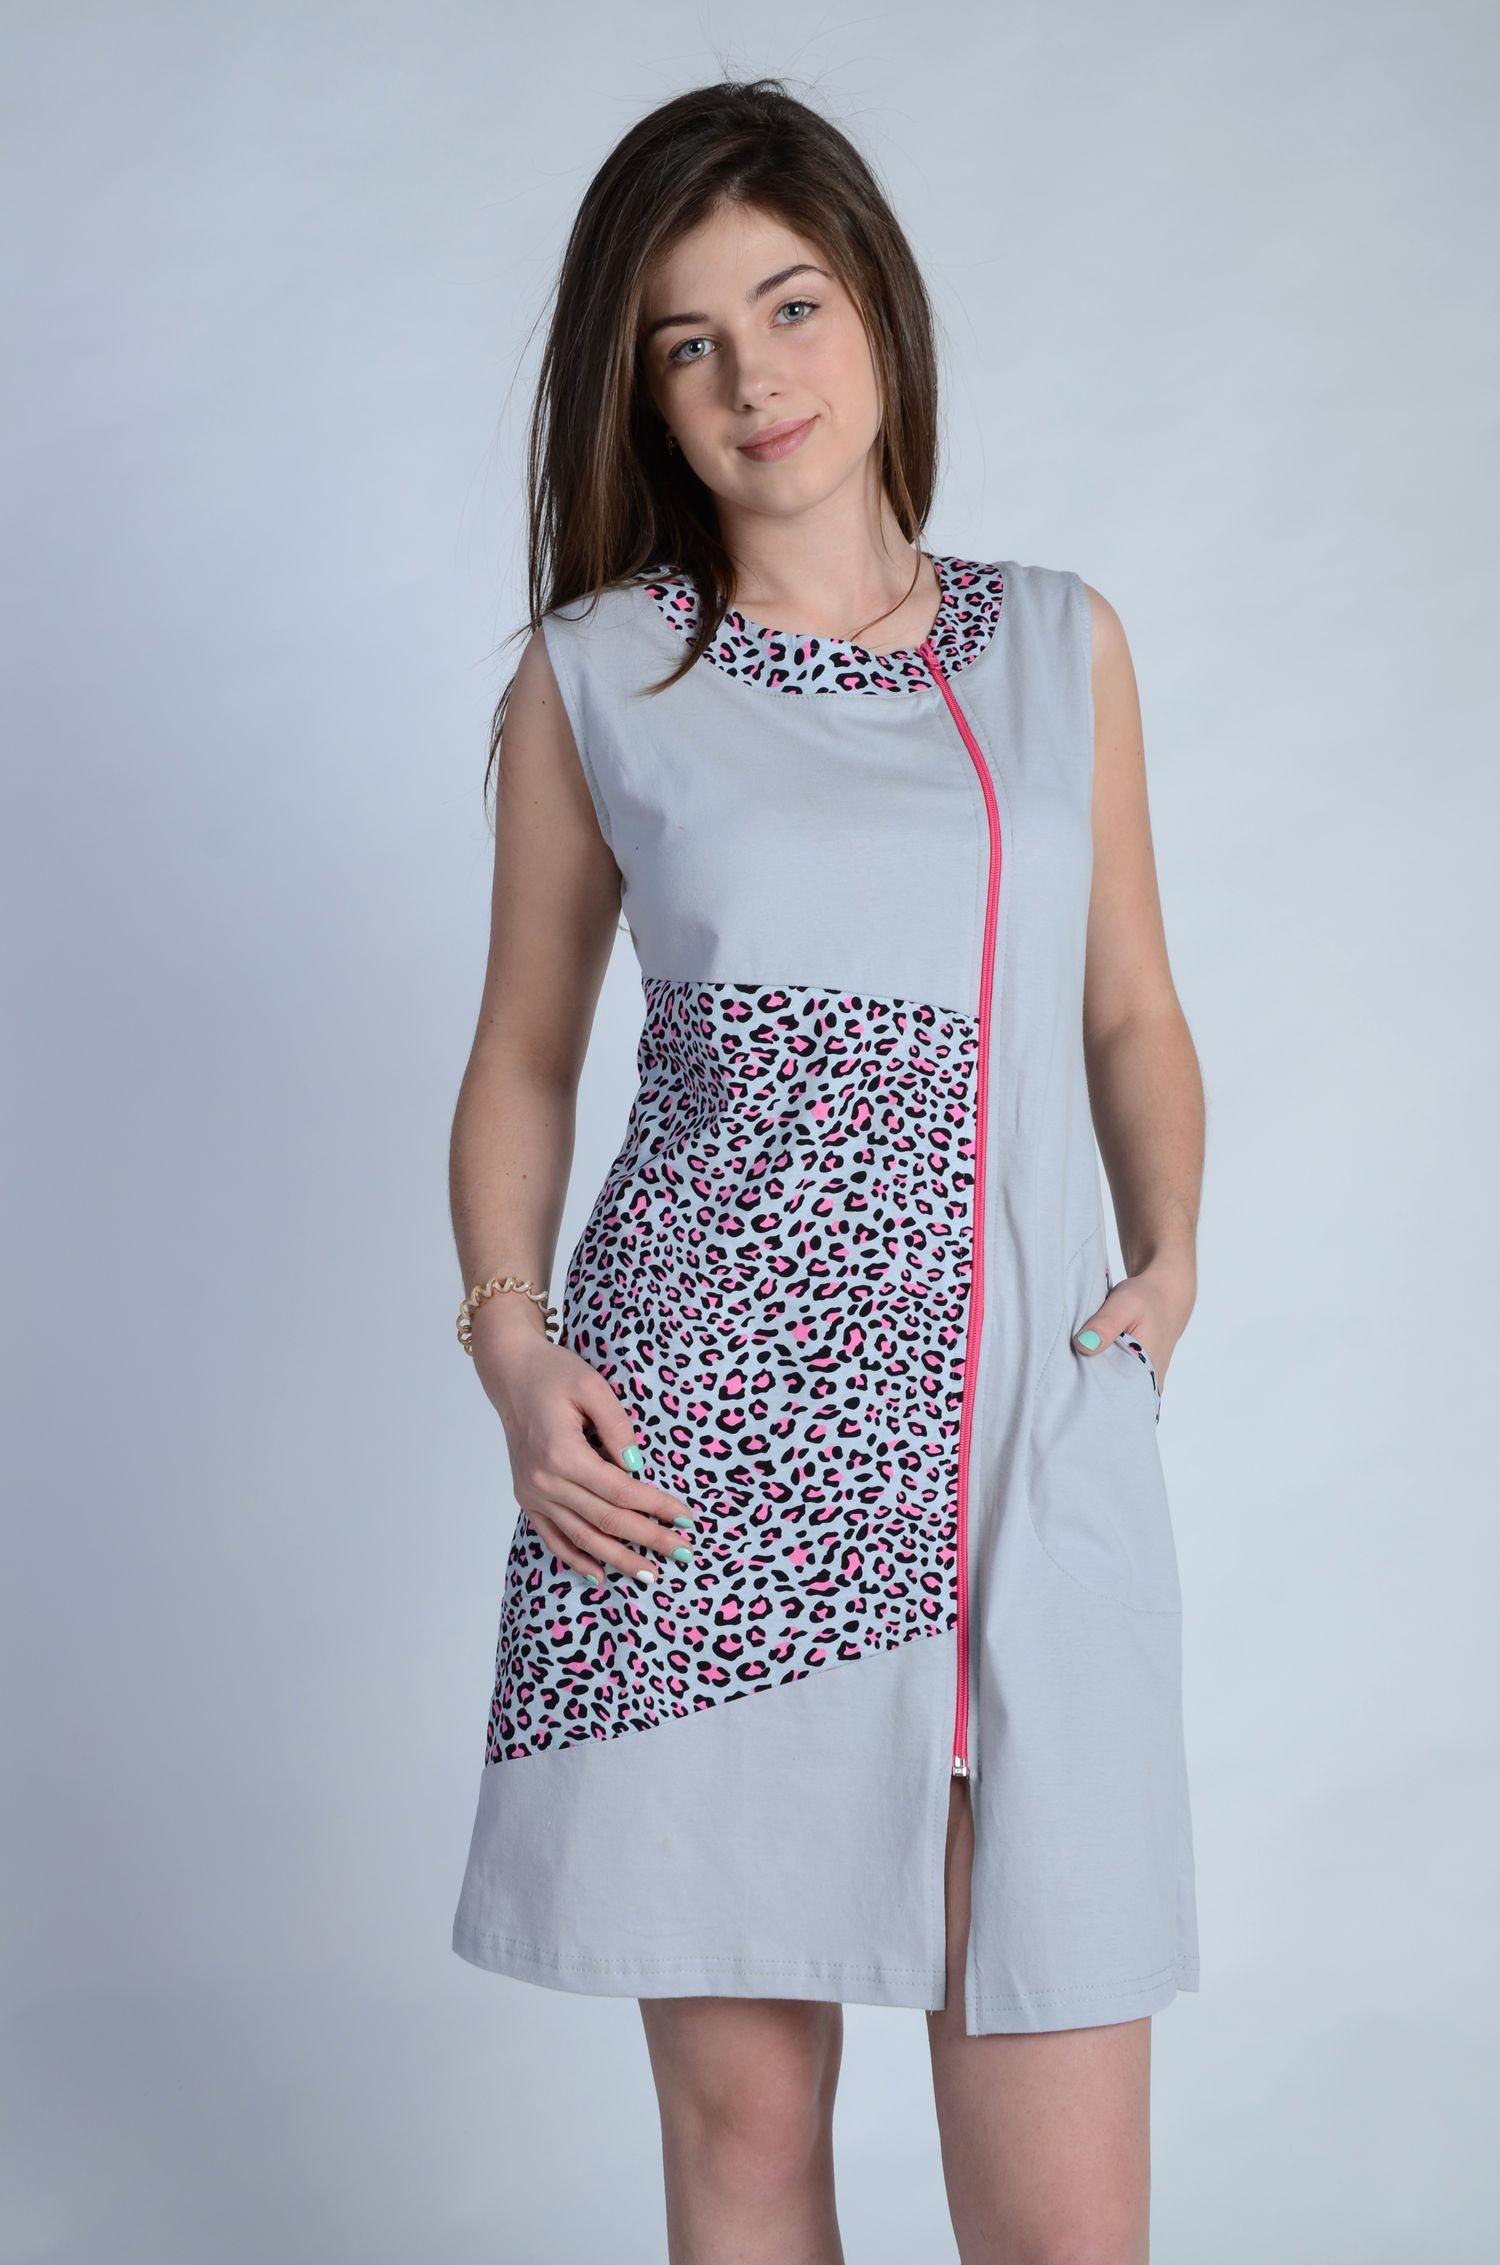 Халат женский Сафари на молнииДомашняя одежда<br><br><br>Размер: 58